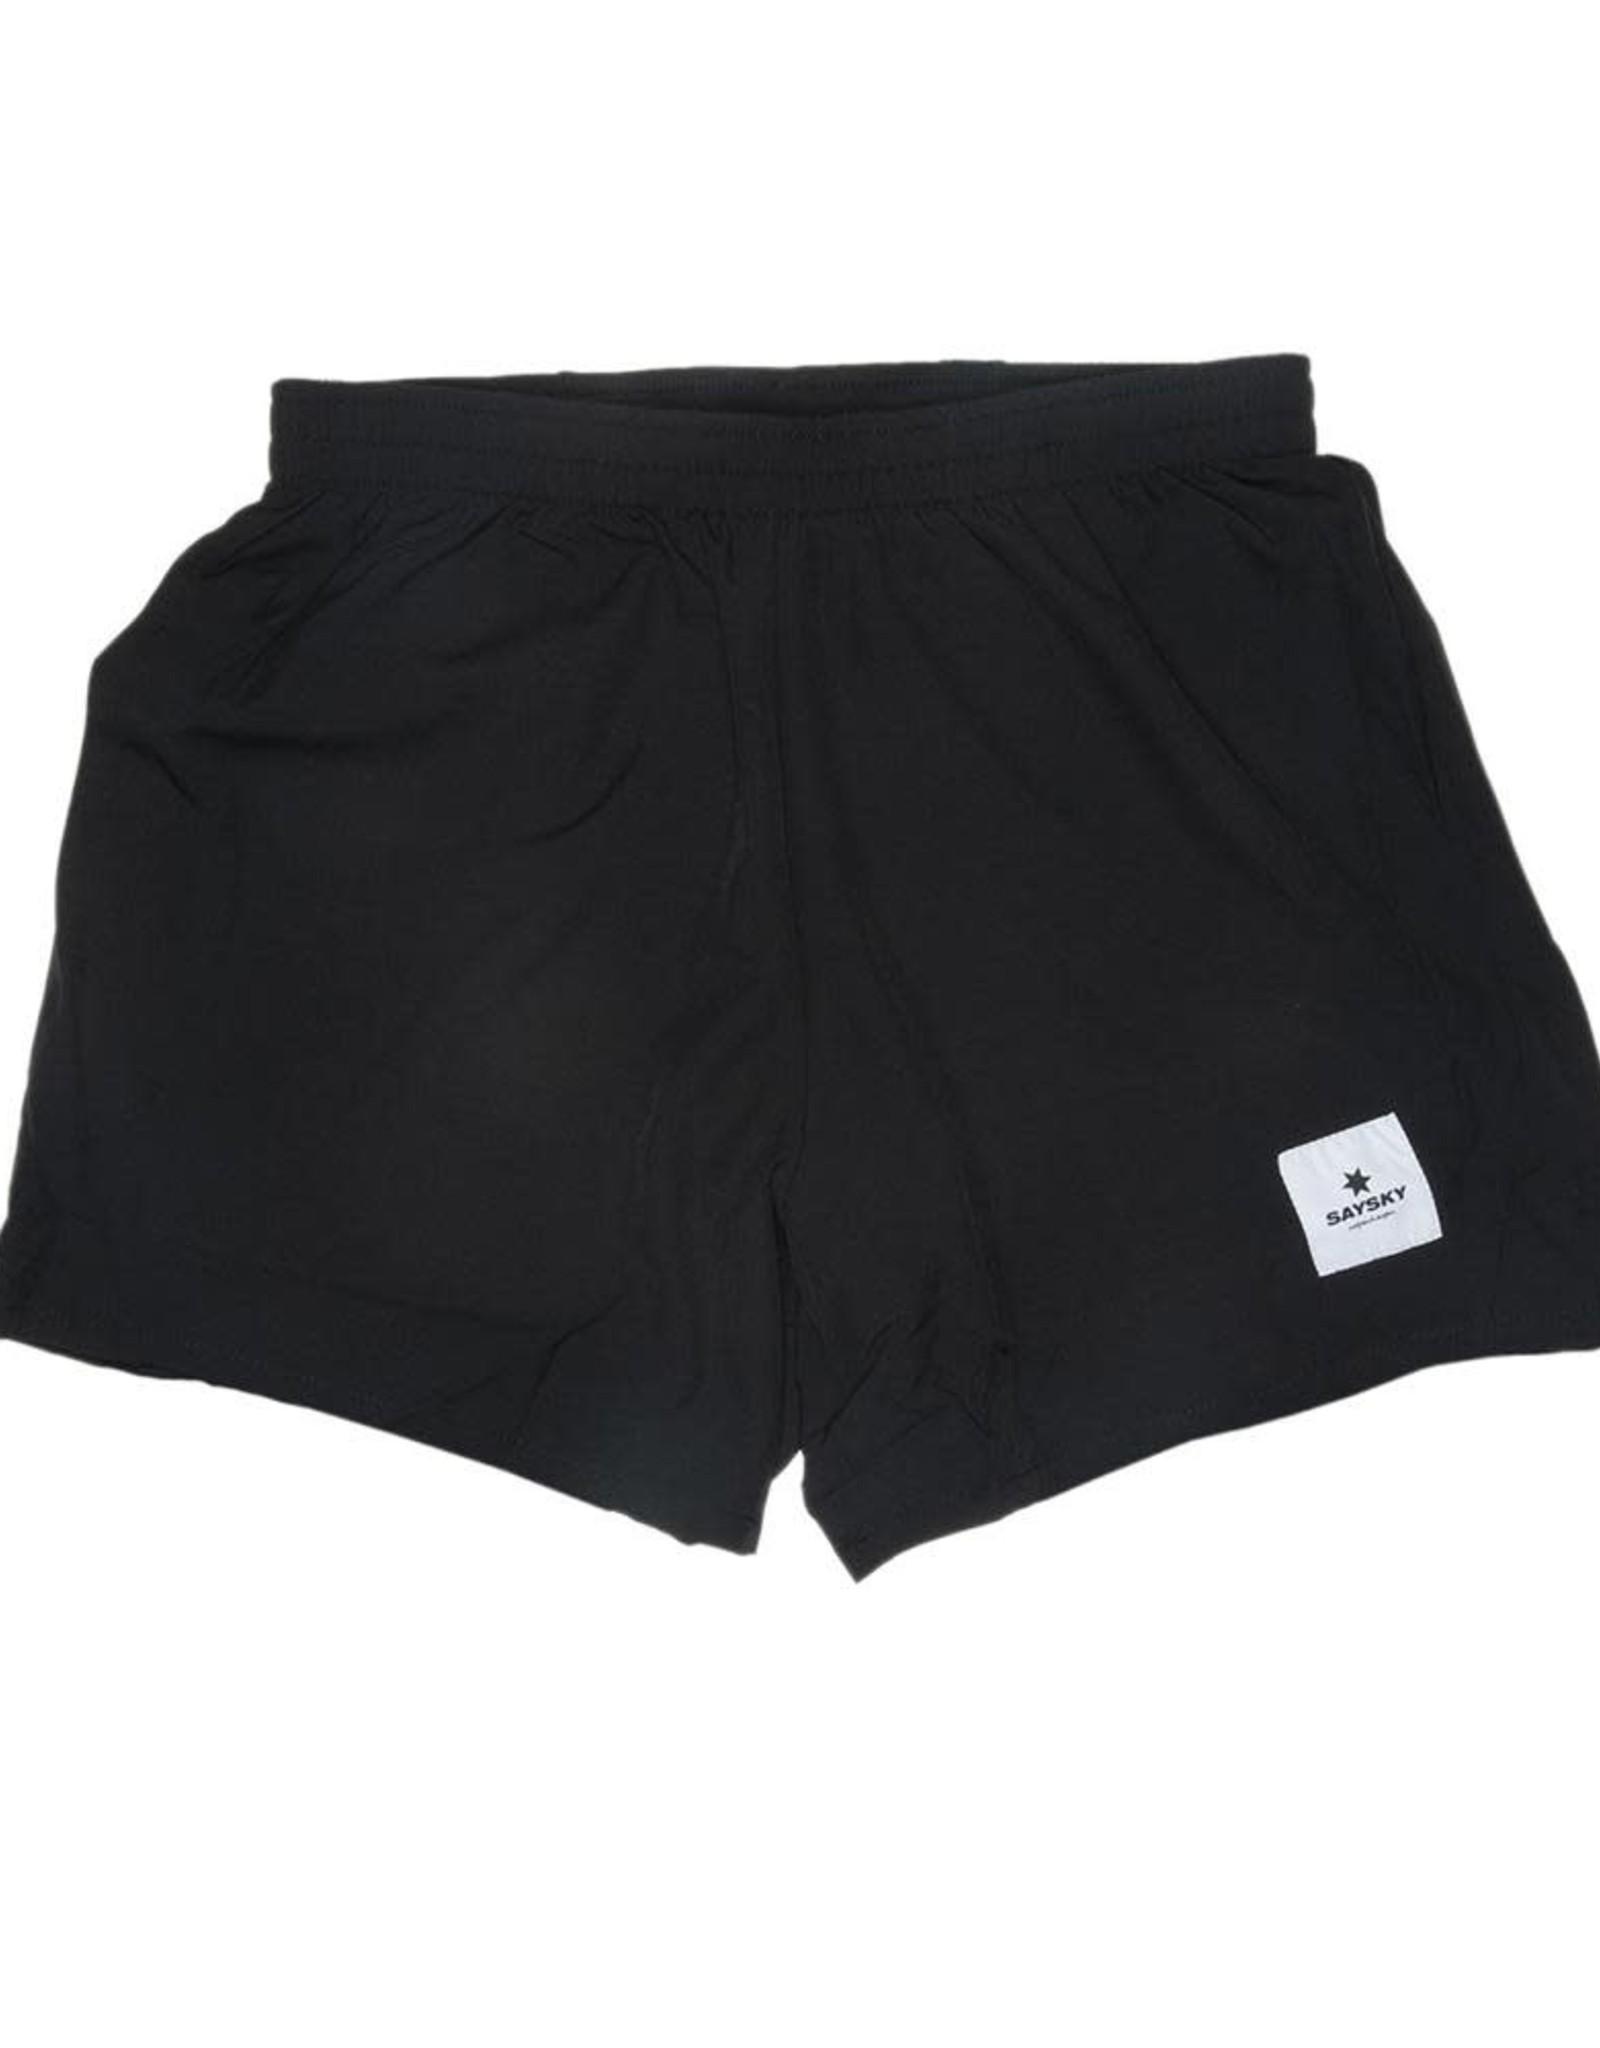 Saysky BMRSH11 Pace shorts